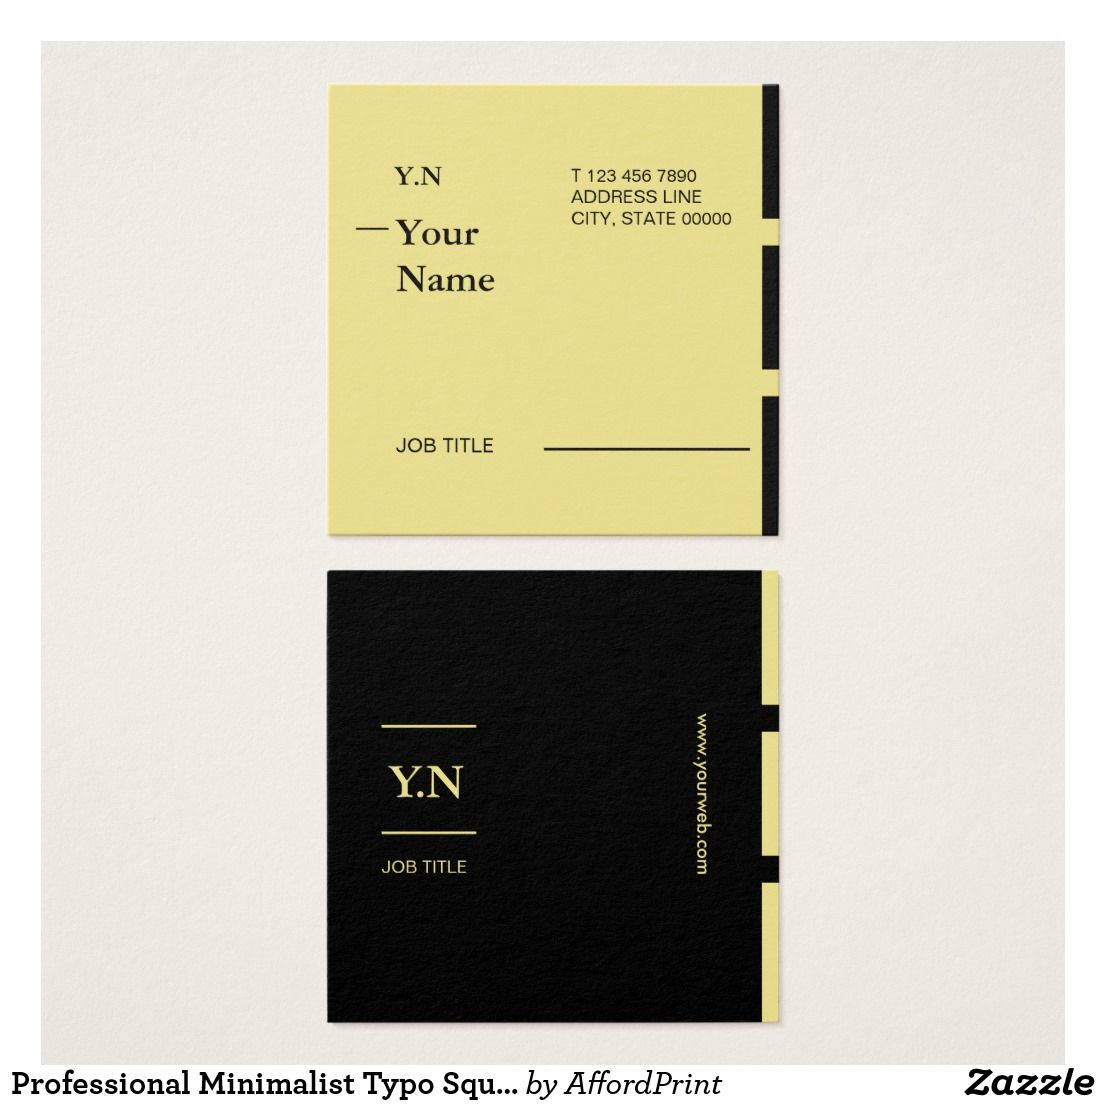 Professional Minimalist Typo Square Business Card Printing Business Cards Professional Business Cards Square Business Card